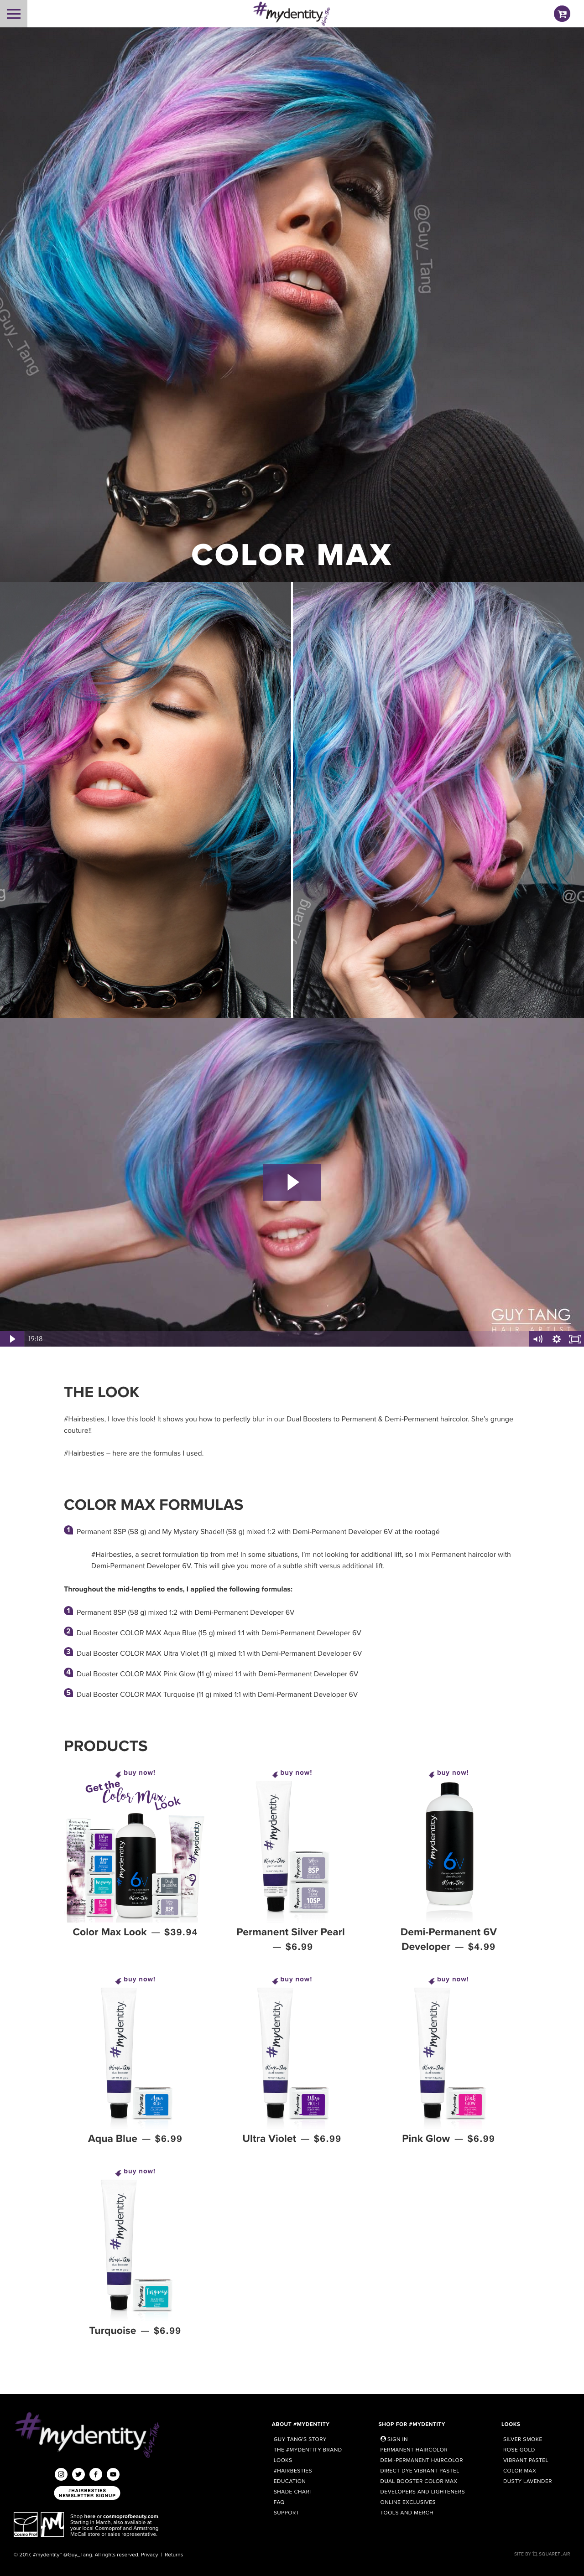 Screencapture shop mydentitycolor collections color max look 1487358266155